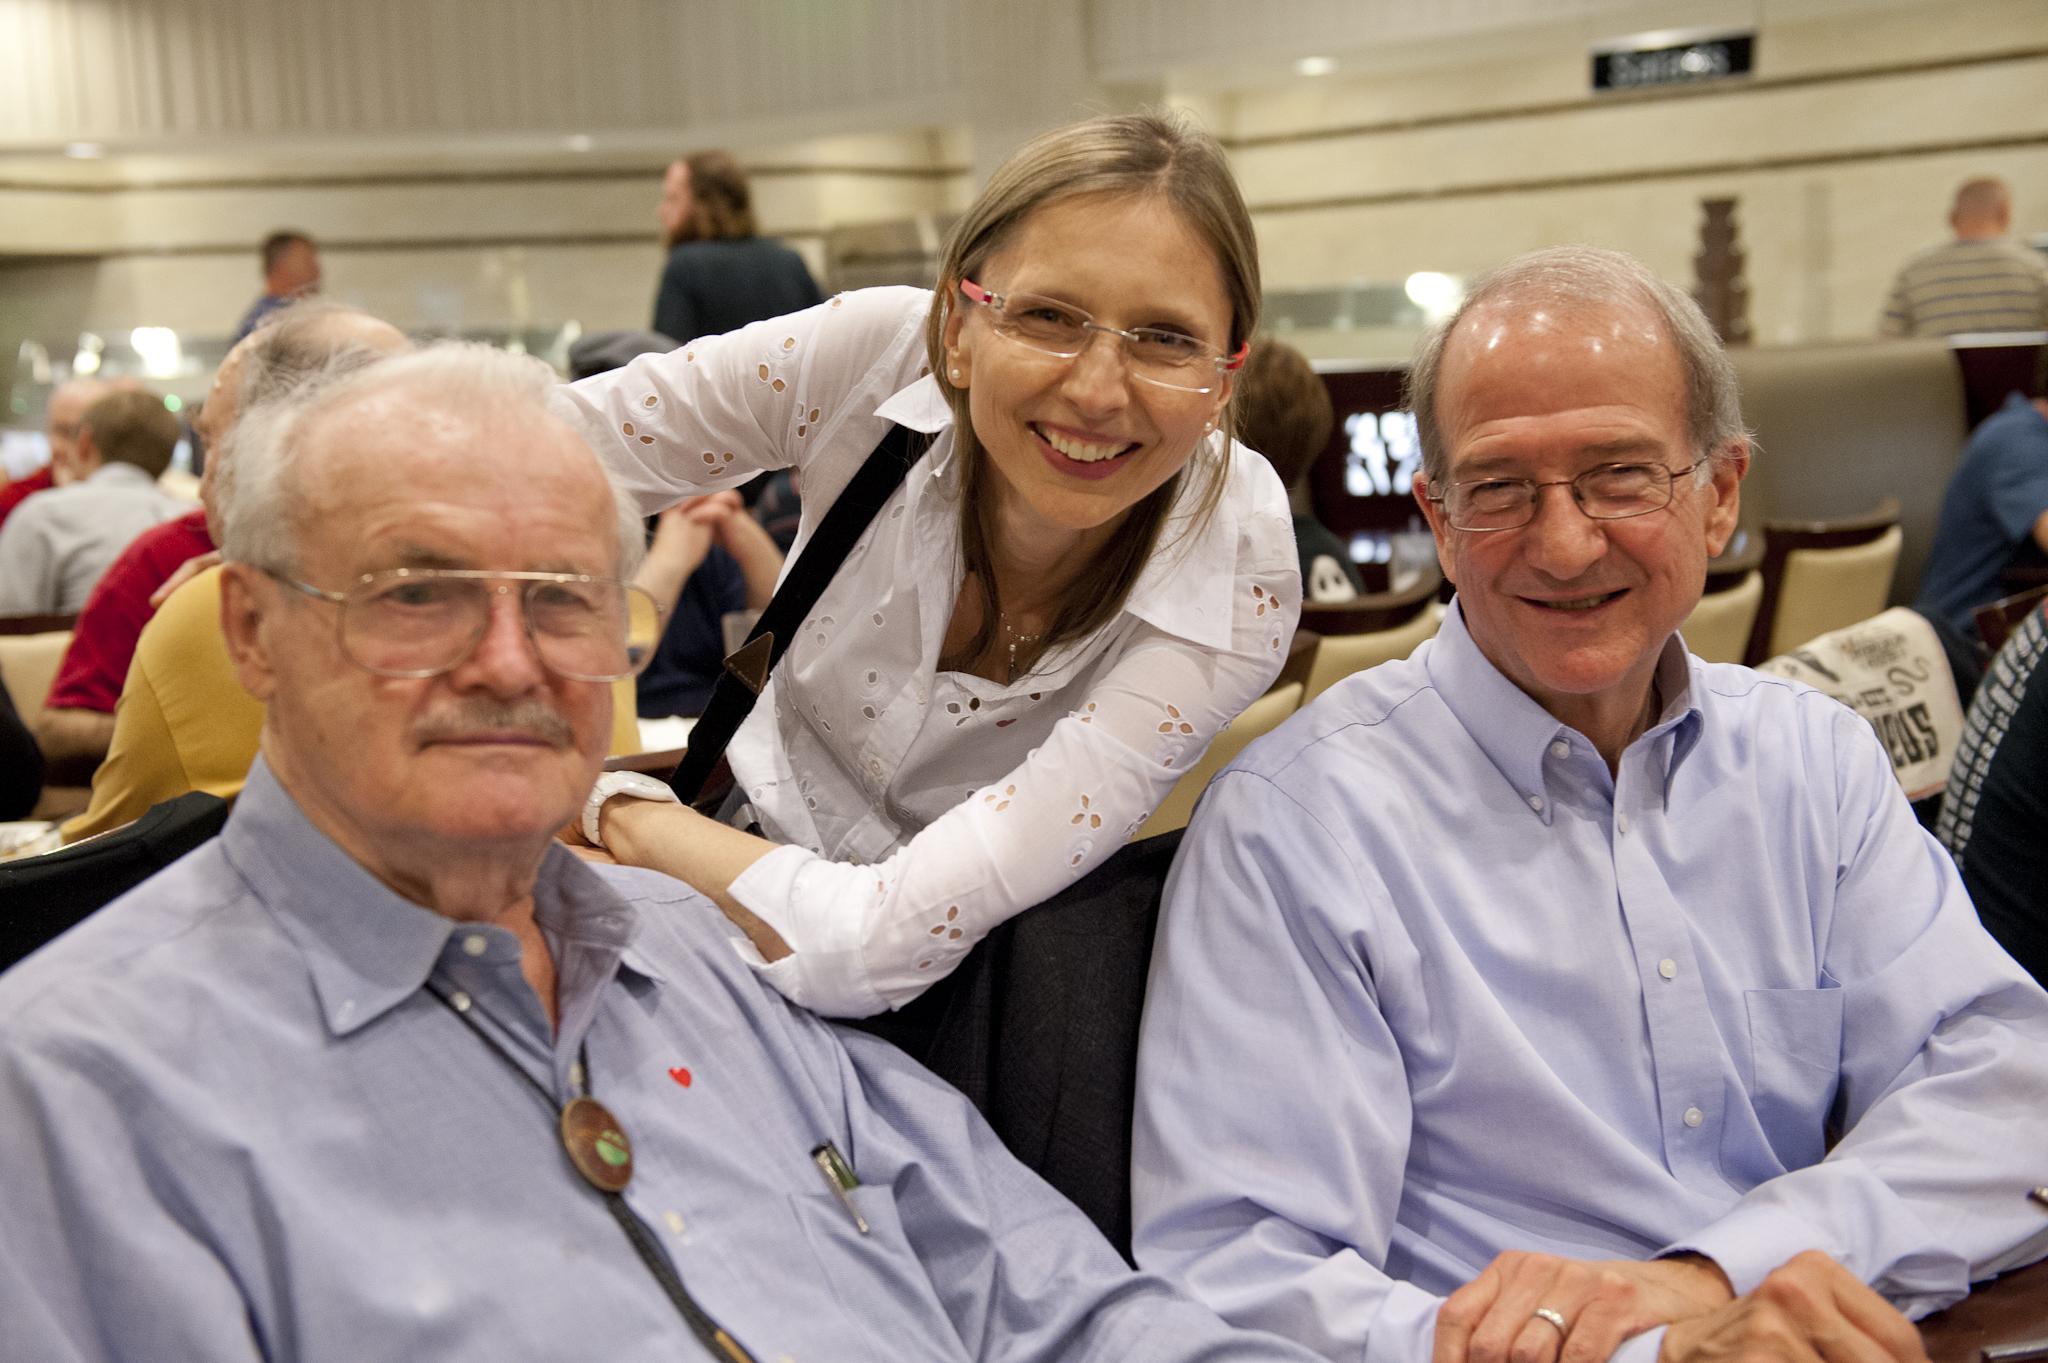 Jerry Pournelle, Gunhild Jacobs and Doug Beason.